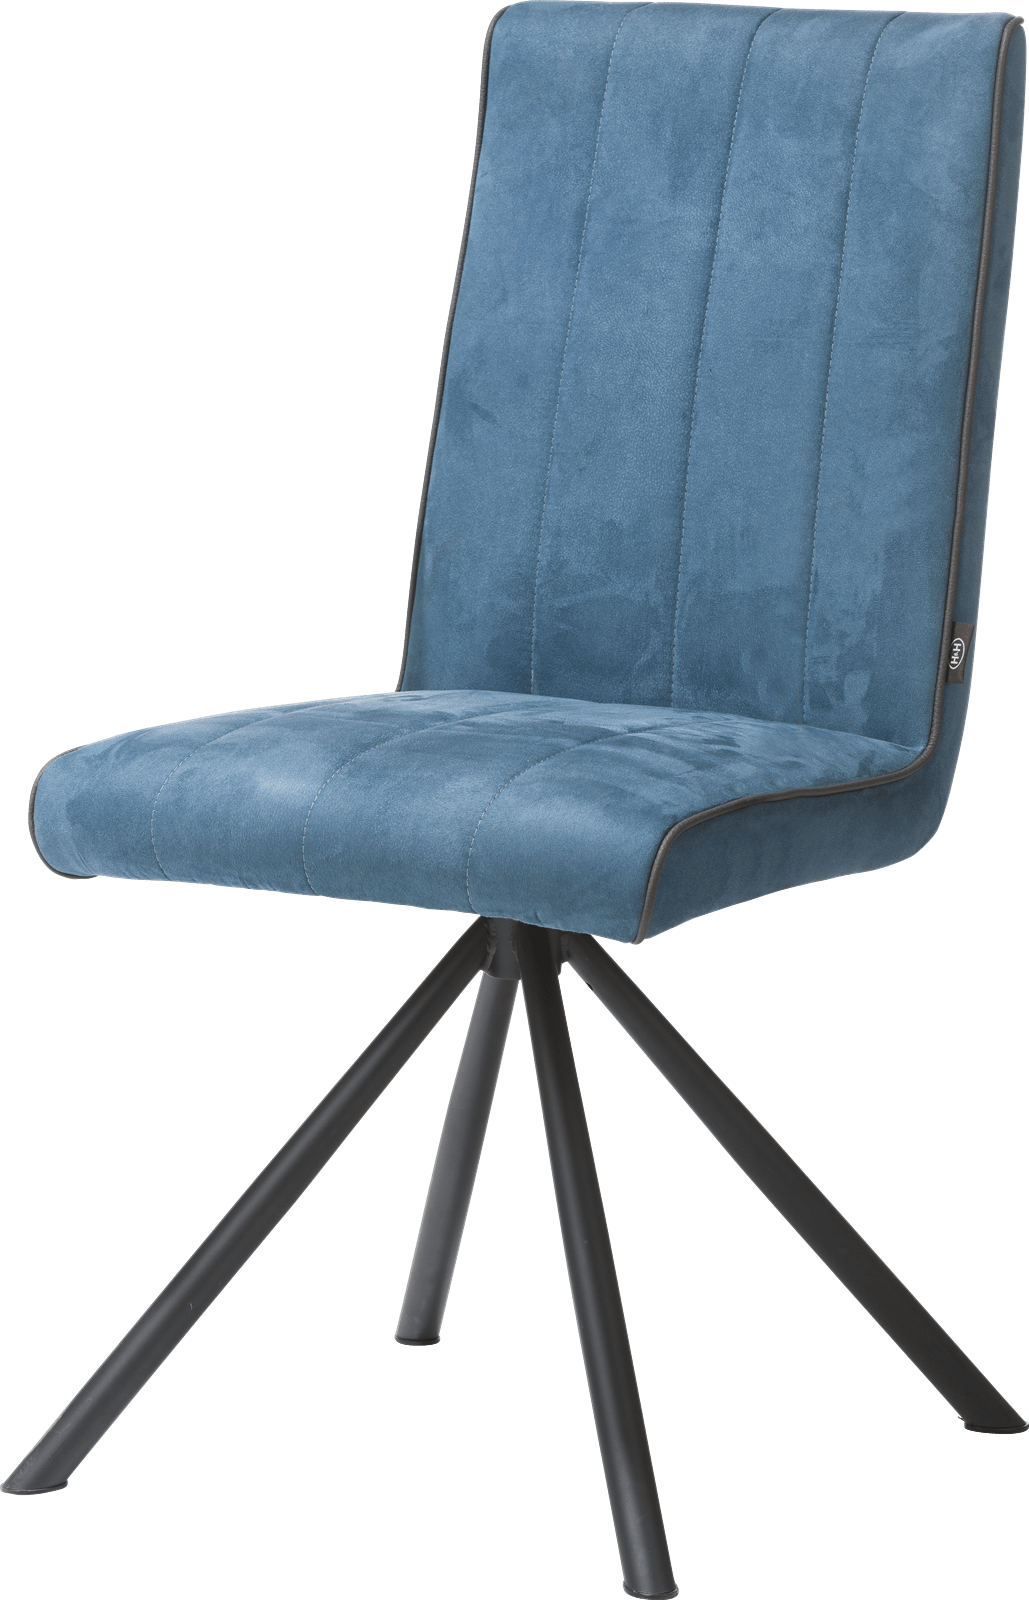 Salle A Manger H&h elza chaise - 4 pieds noir - tissu calabria 4 couleurs